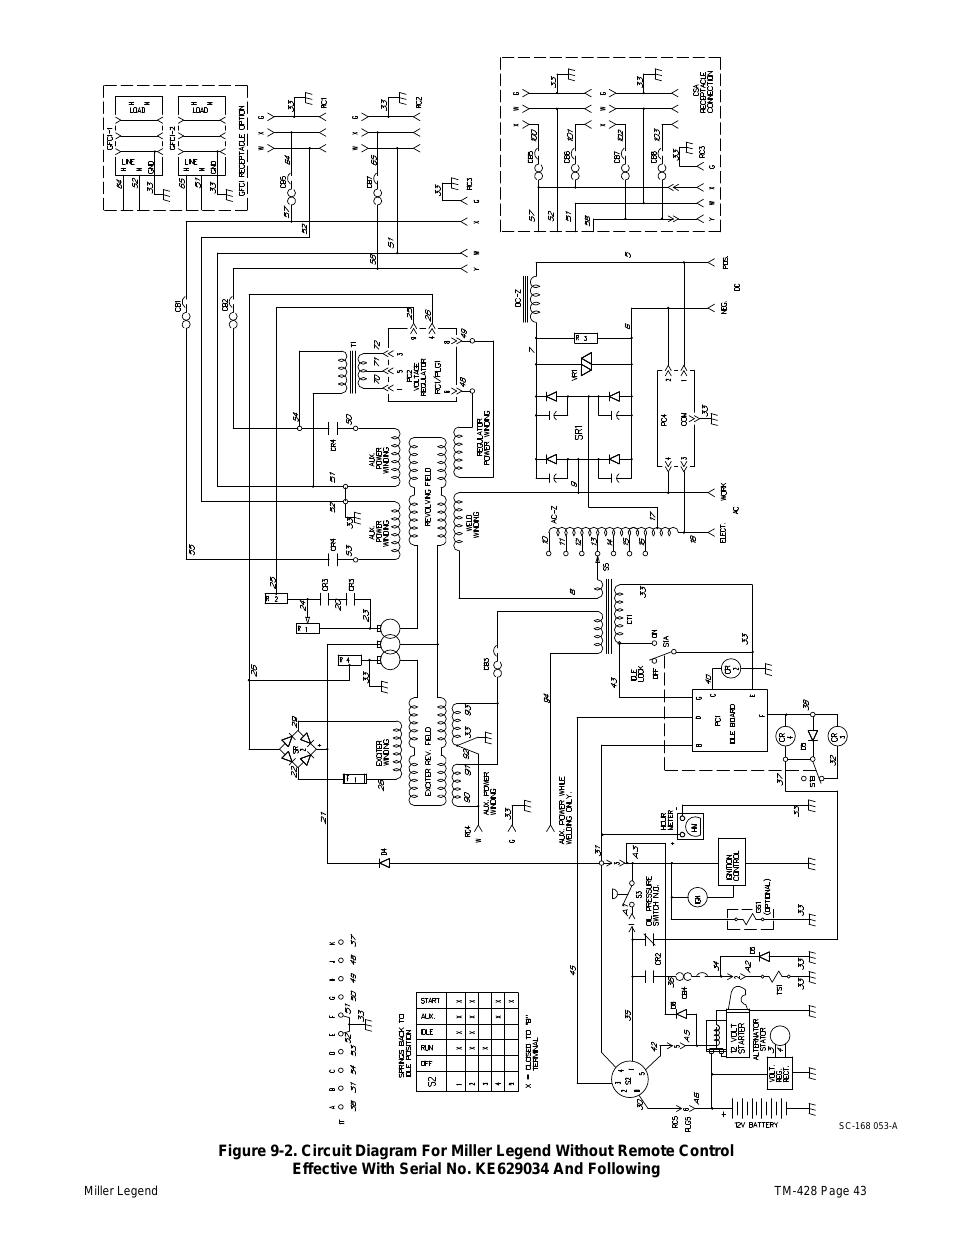 medium resolution of 954x1235 miller legend wiring diagram free download wiring diagram xwiaw